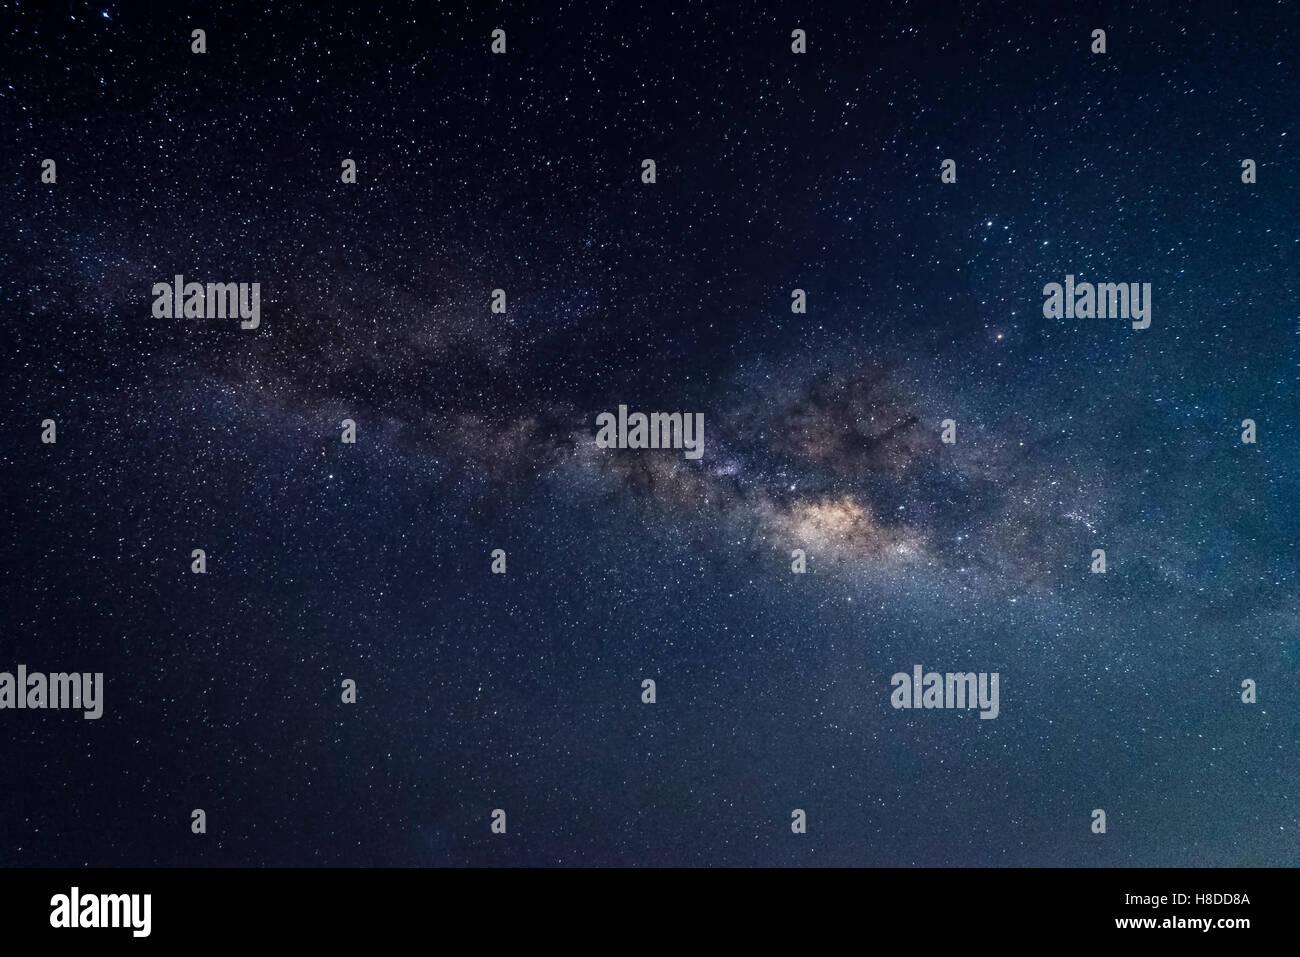 Milky Way Galaxy. High resolution. - Stock Image